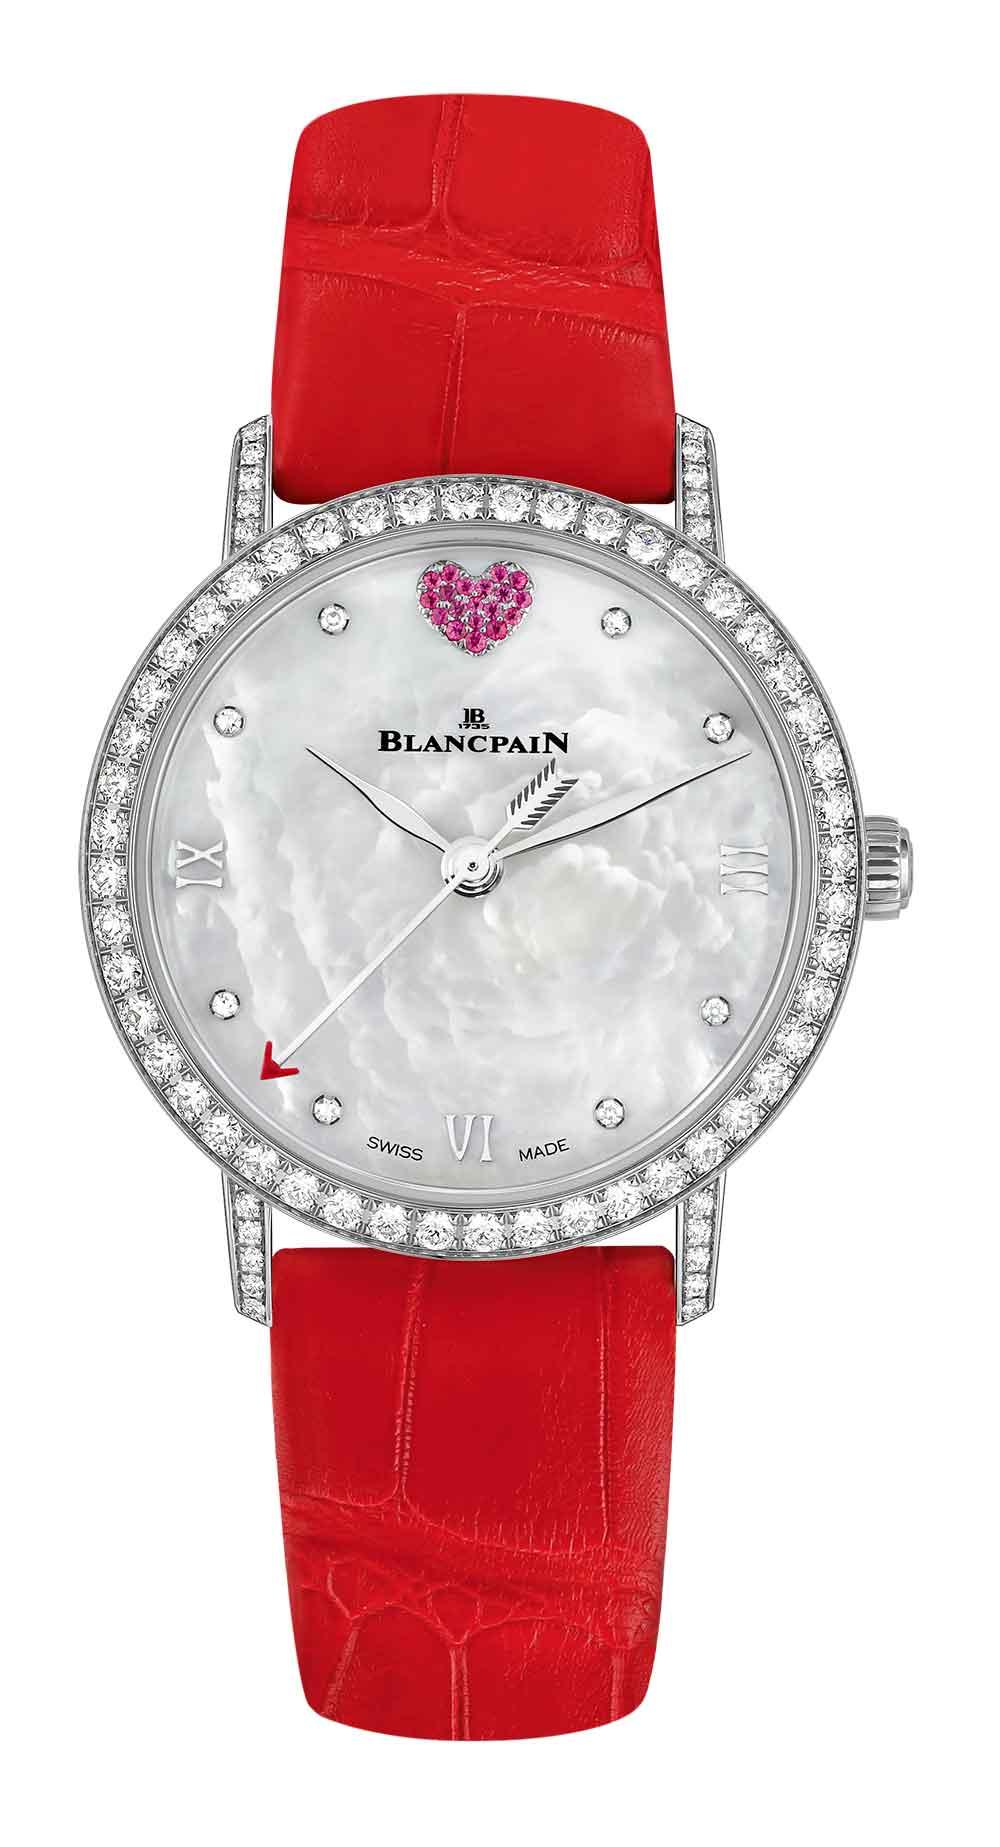 Blancpain Saint-Valentin 2017 reference 6104-4654-99A